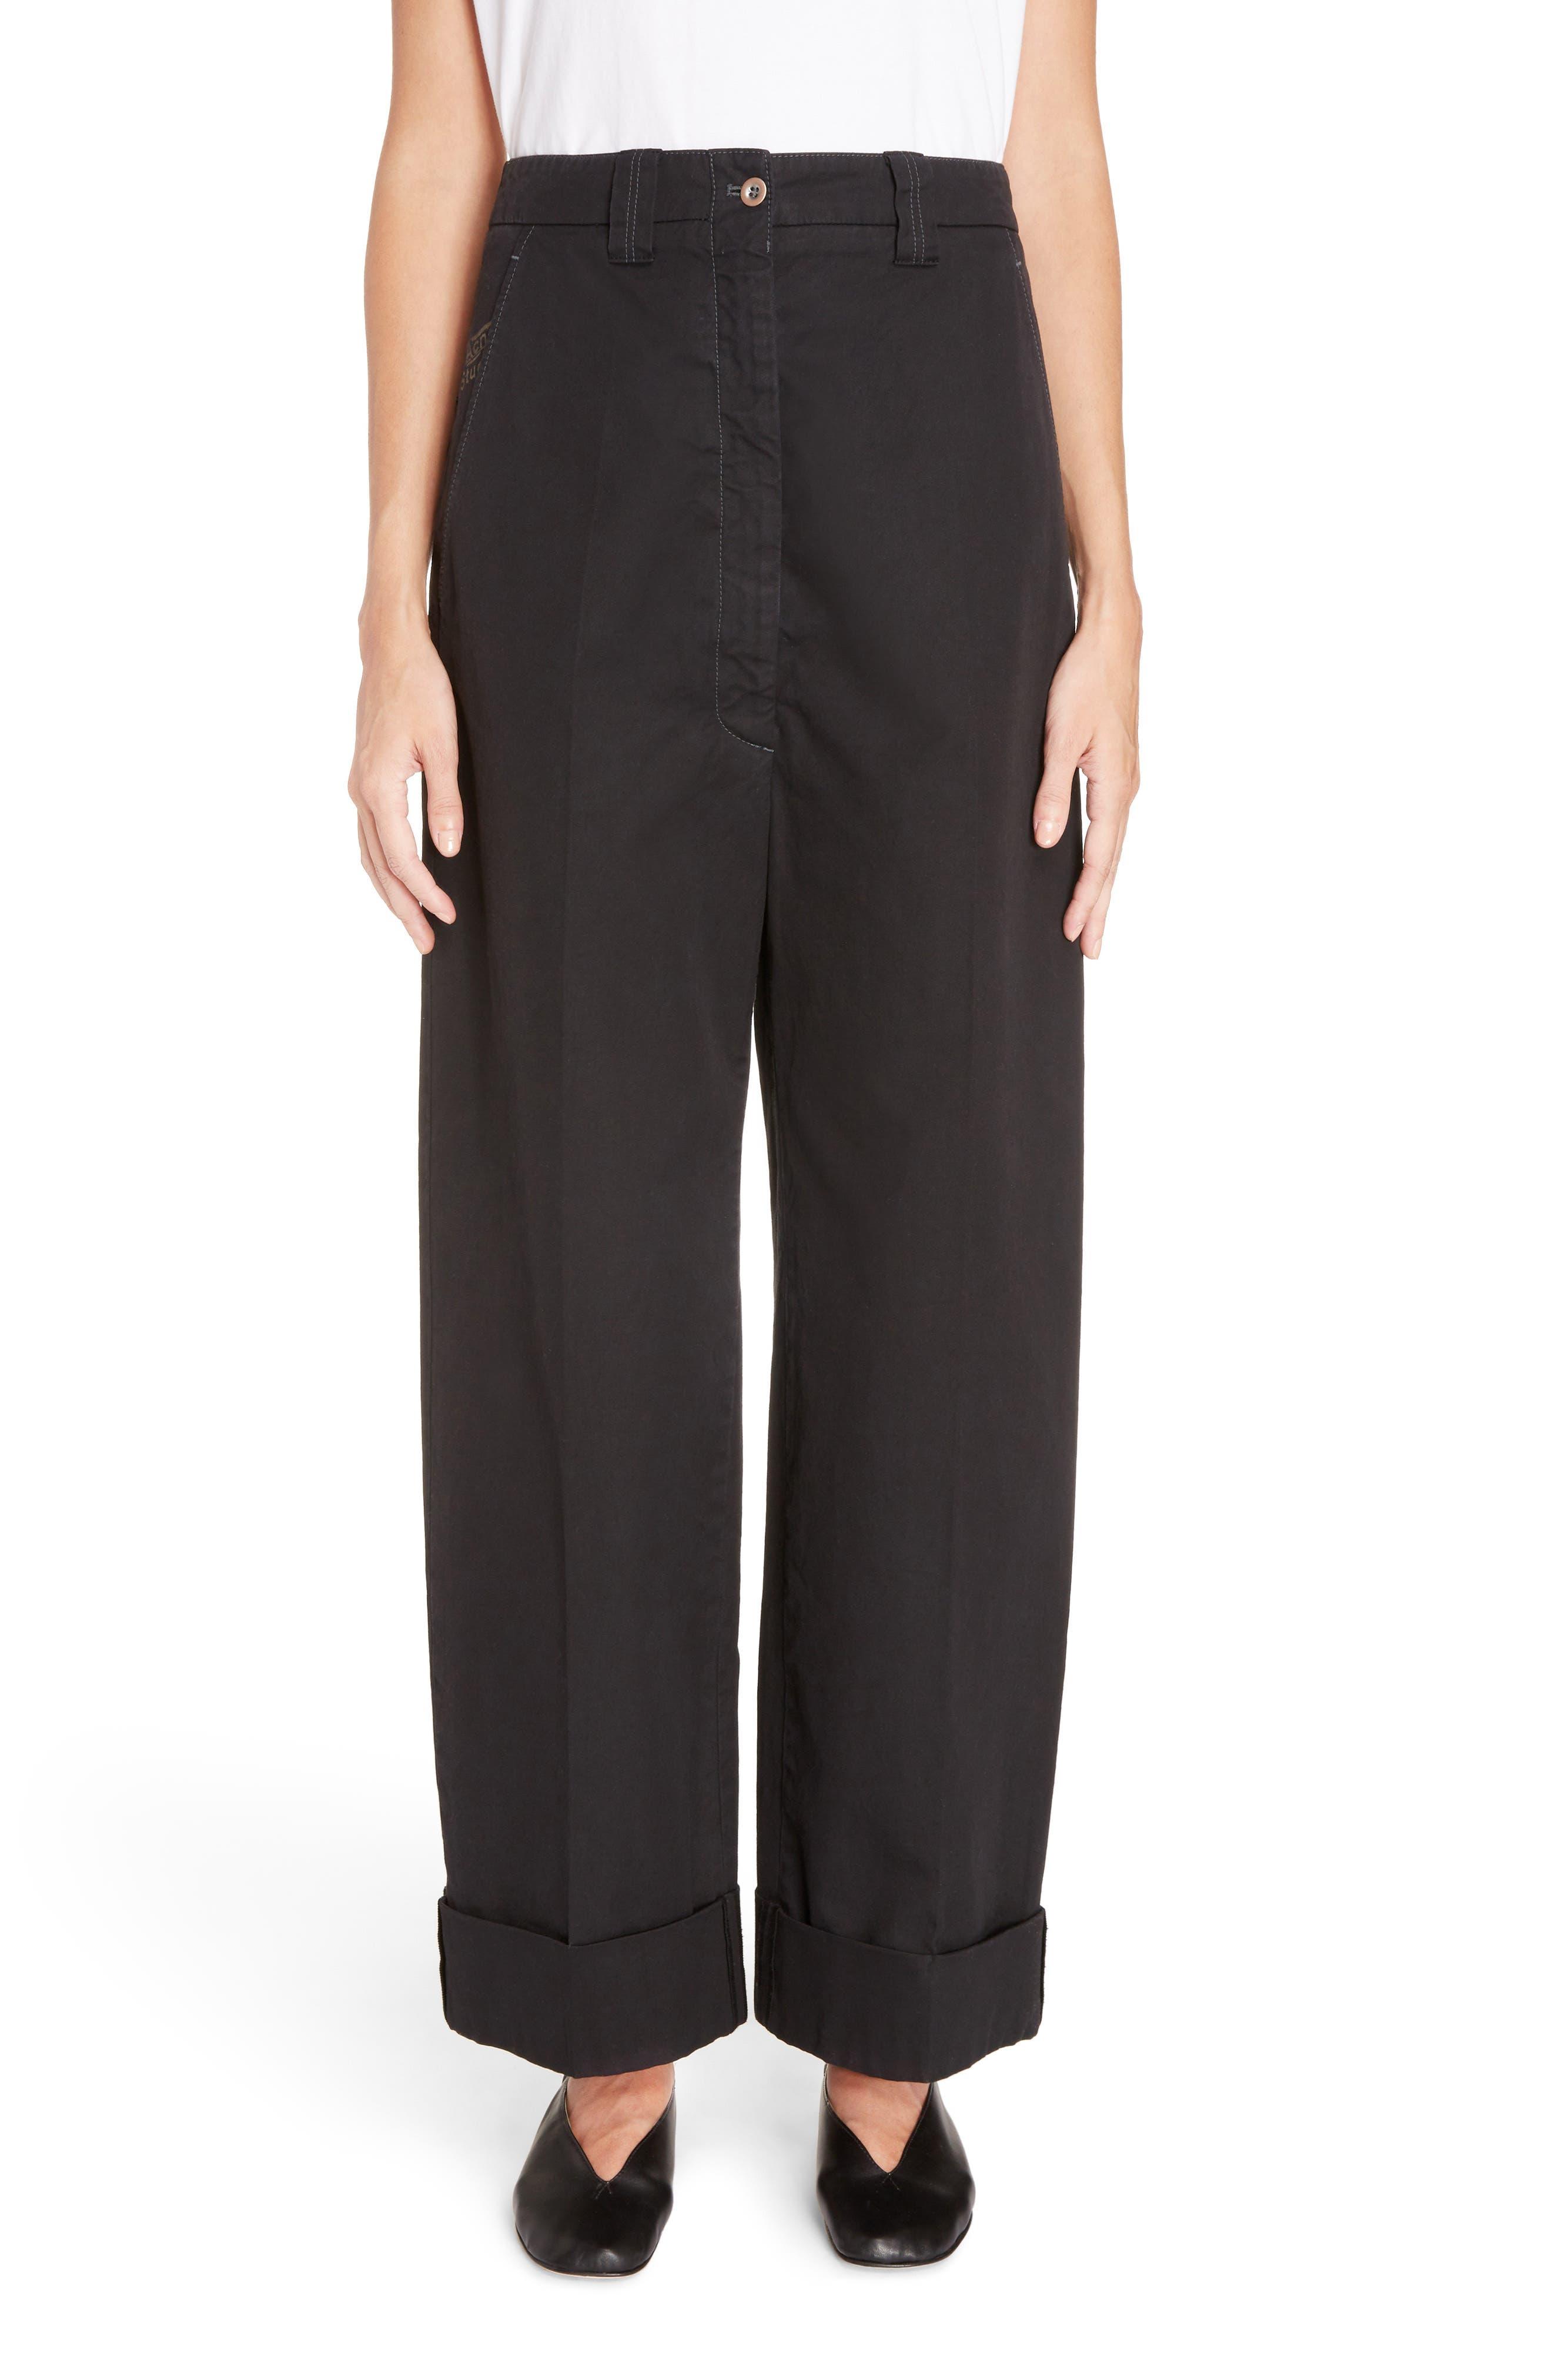 Madya Cuffed Cotton Pants,                         Main,                         color, Black